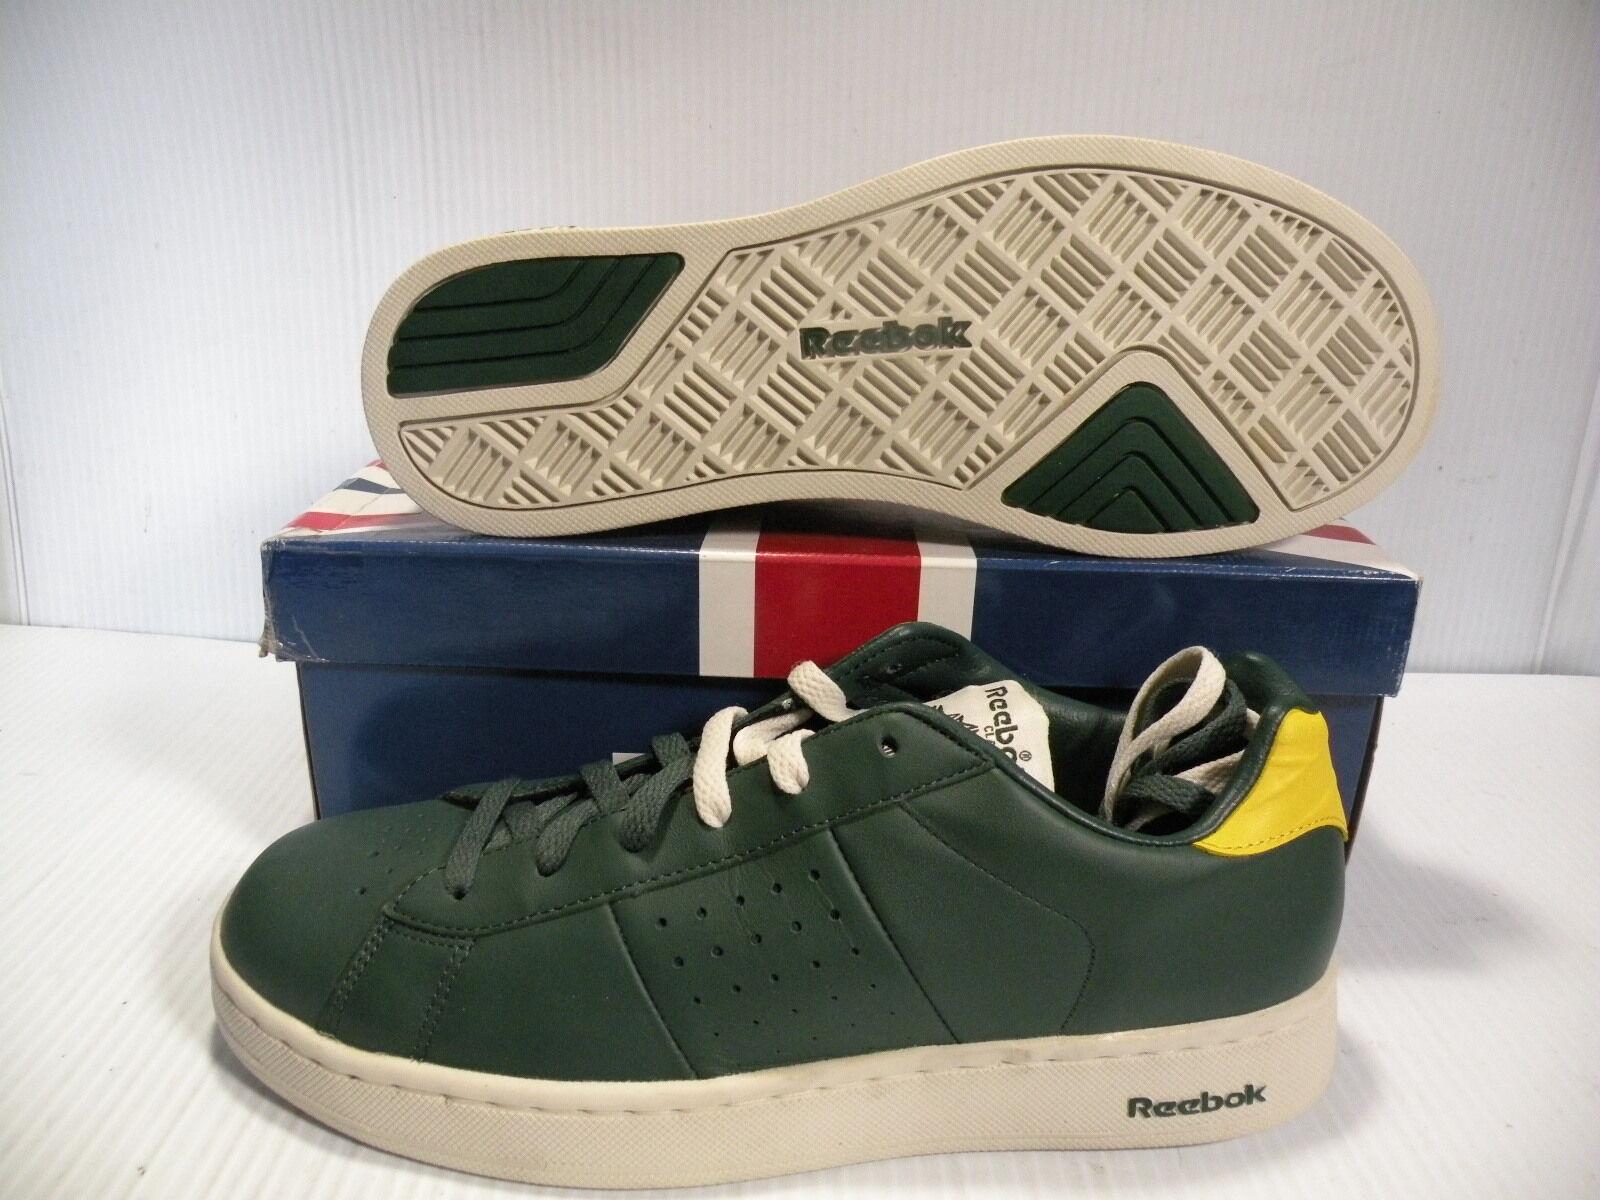 REEBOK CLASSIC NPC PLATINUM Tenis Zapatos Tenis Baja Para Hombre  -141058 Talla 10.5 Nuevo